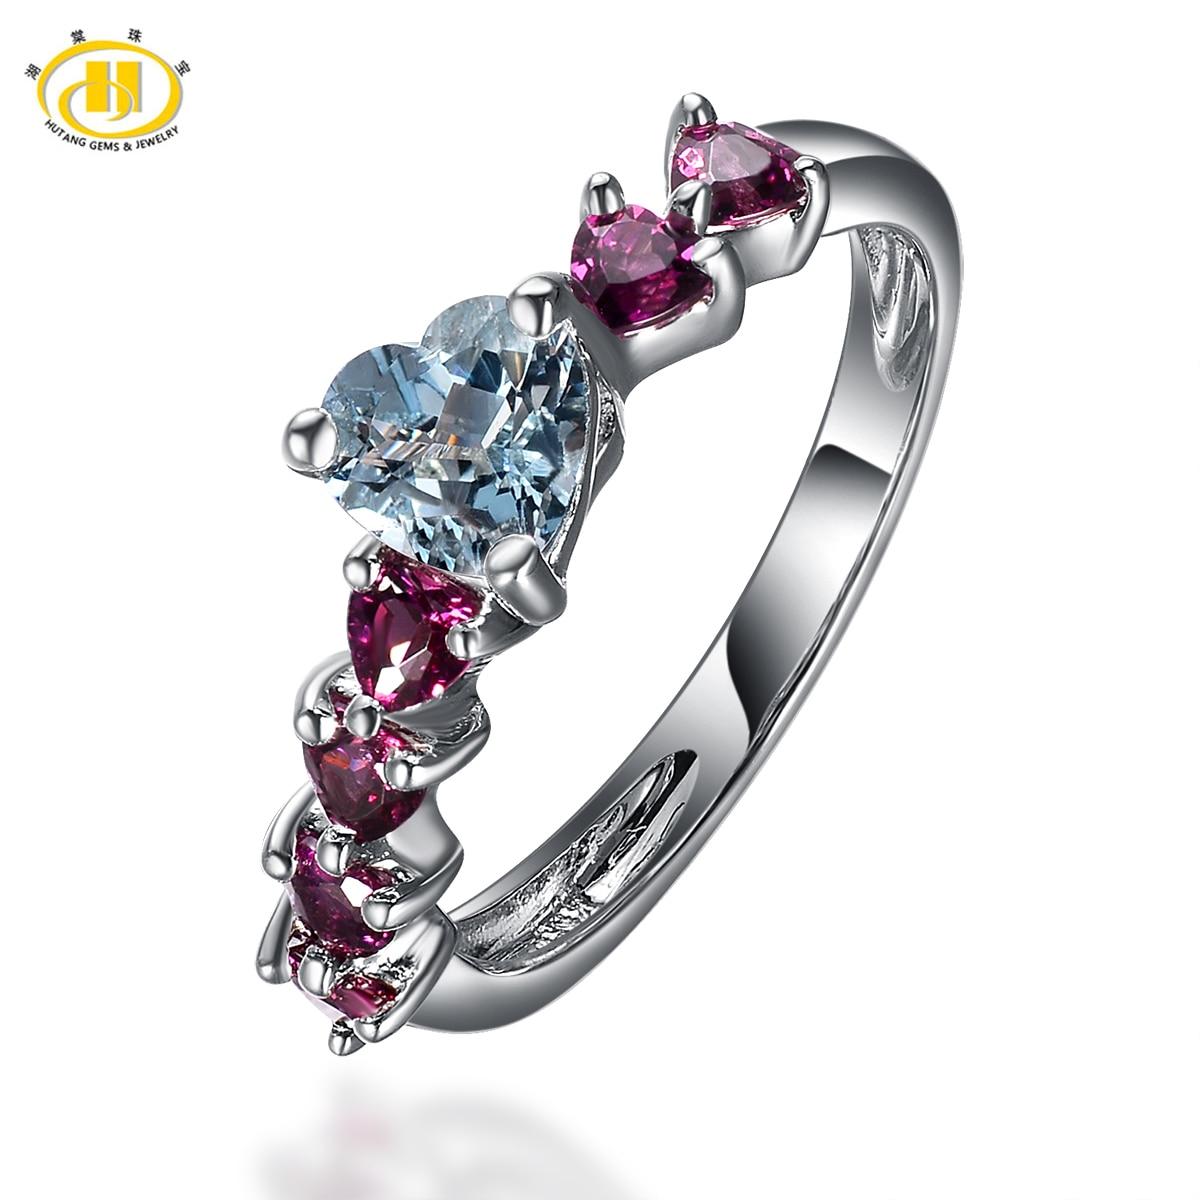 Hutang Womens Natural Aquamarine and Rhodolite Garnet GemstoneRings 925 Sterling Silver Heart Ring Wedding Fine Jewelry Gift